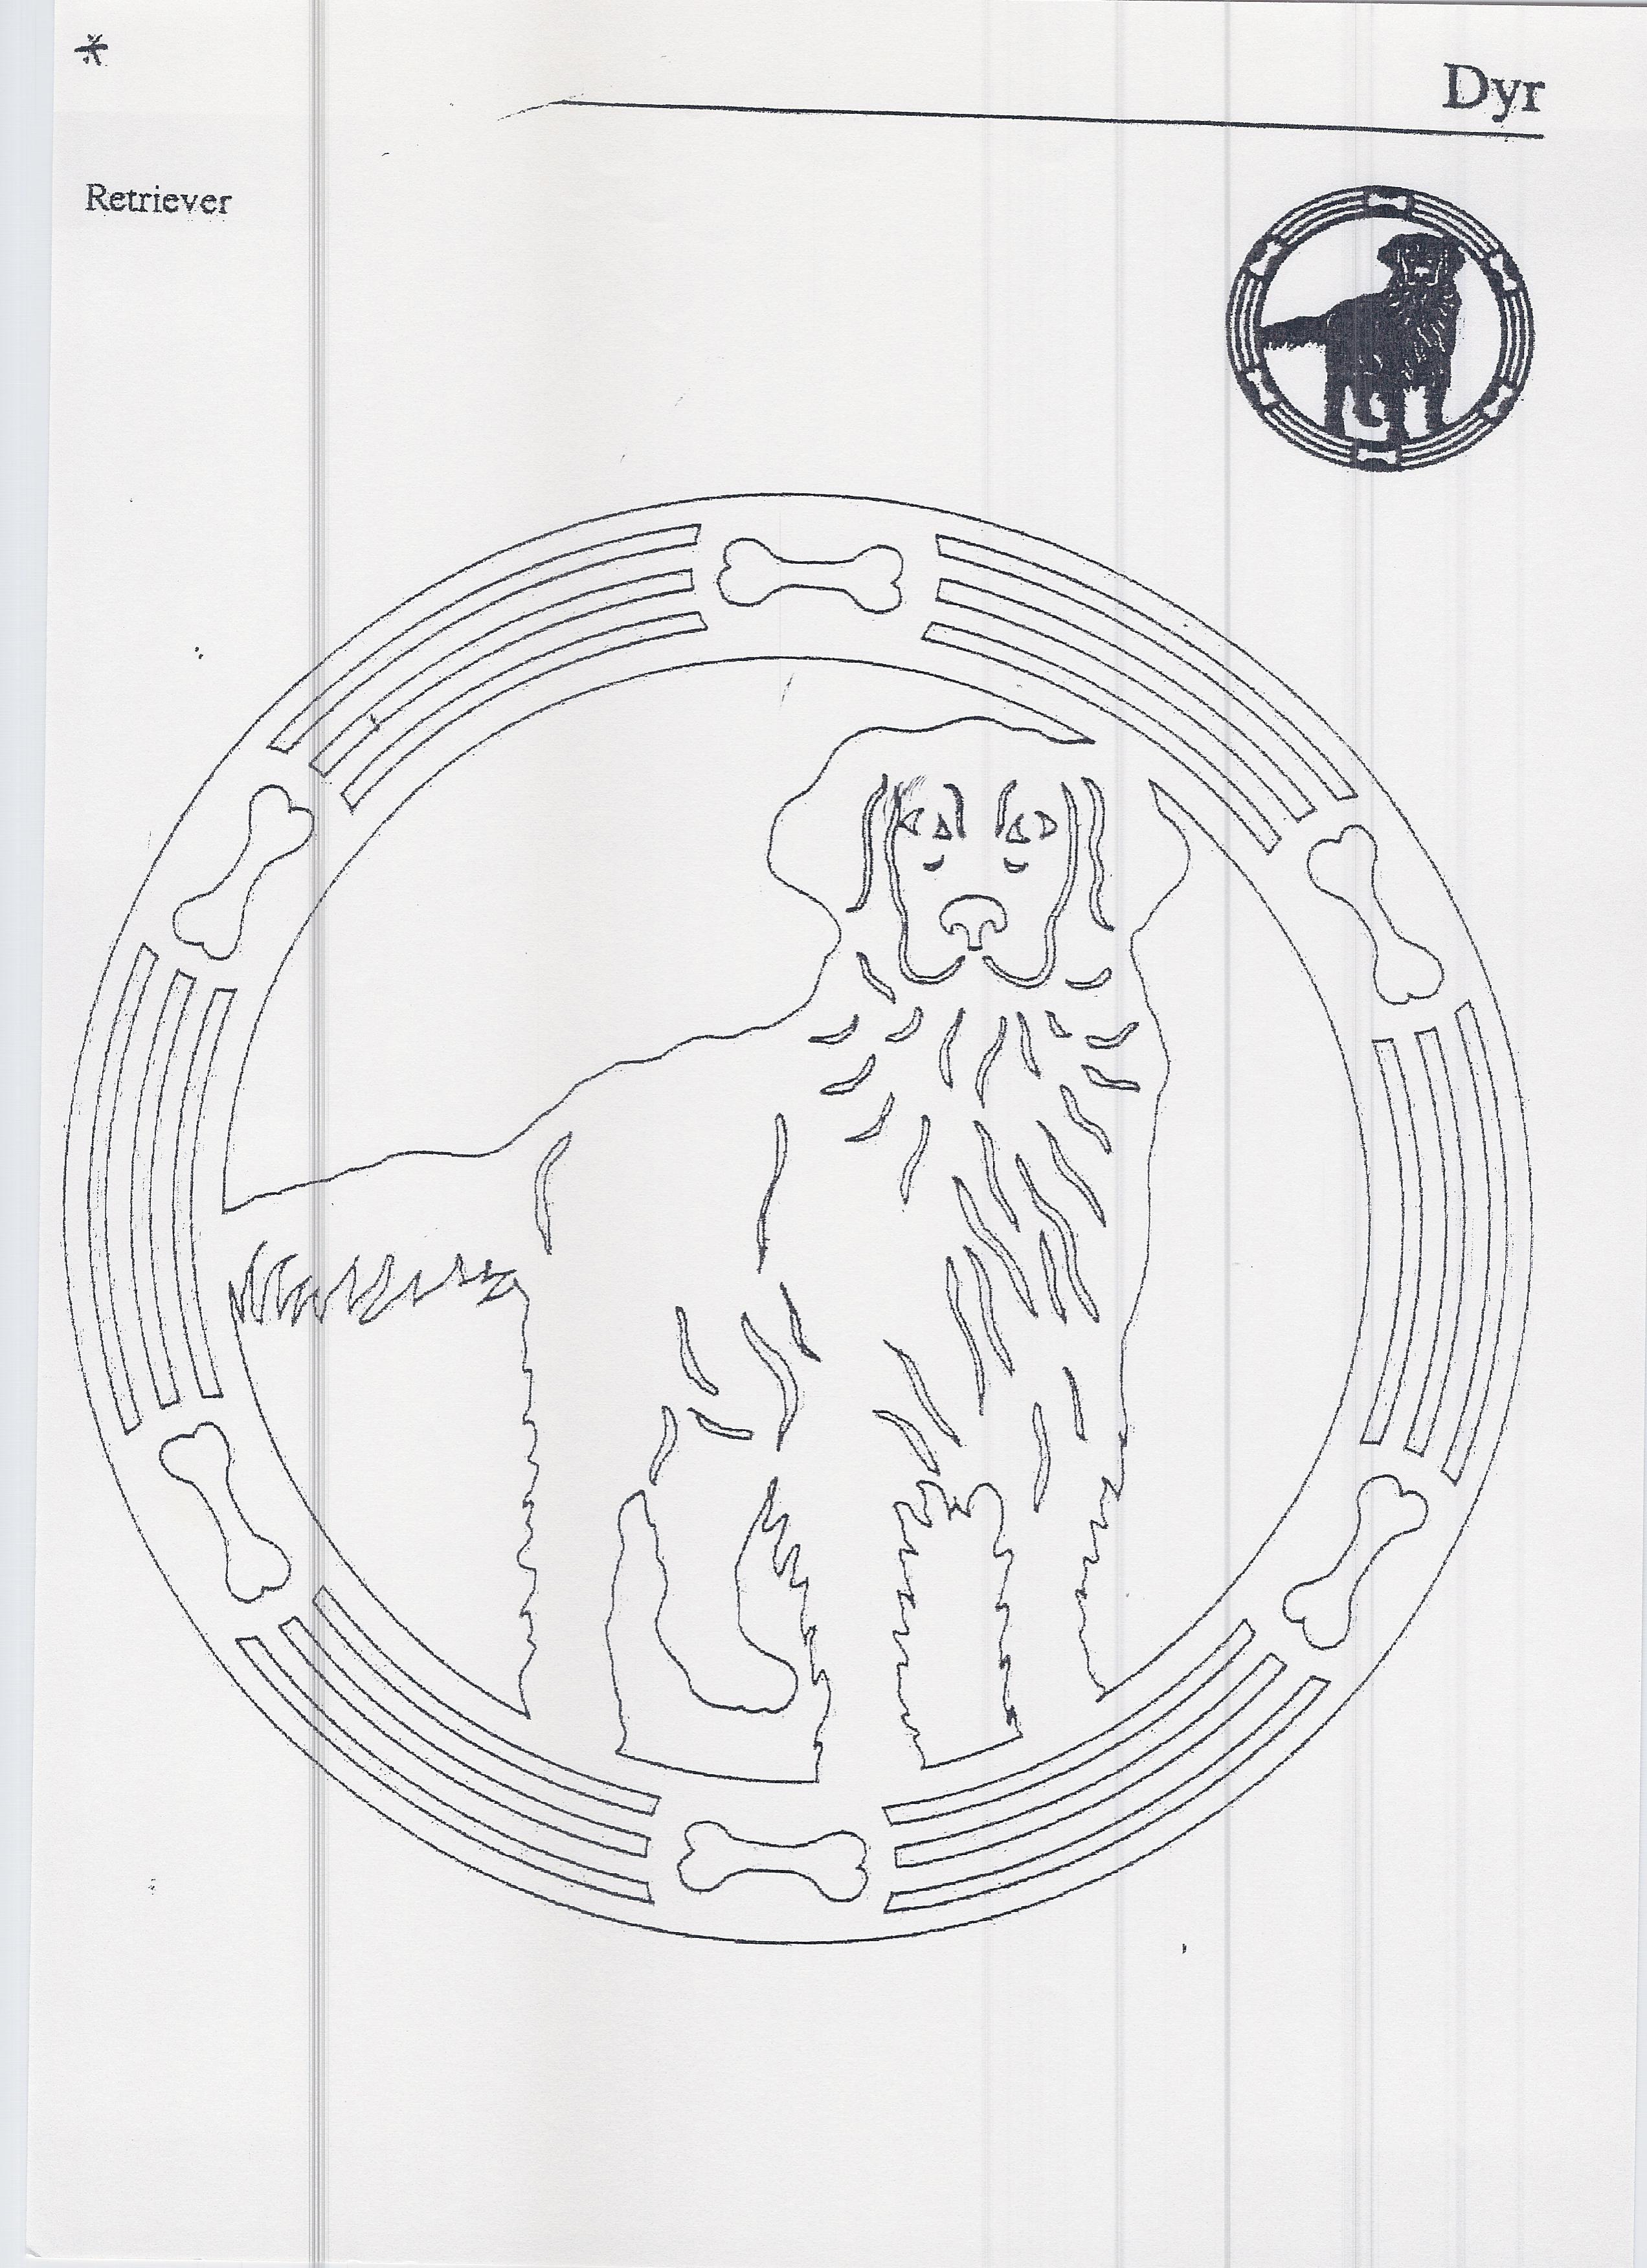 labrador   Filigrany - wycinanki   Pinterest   Laubsäge, Diana und ...